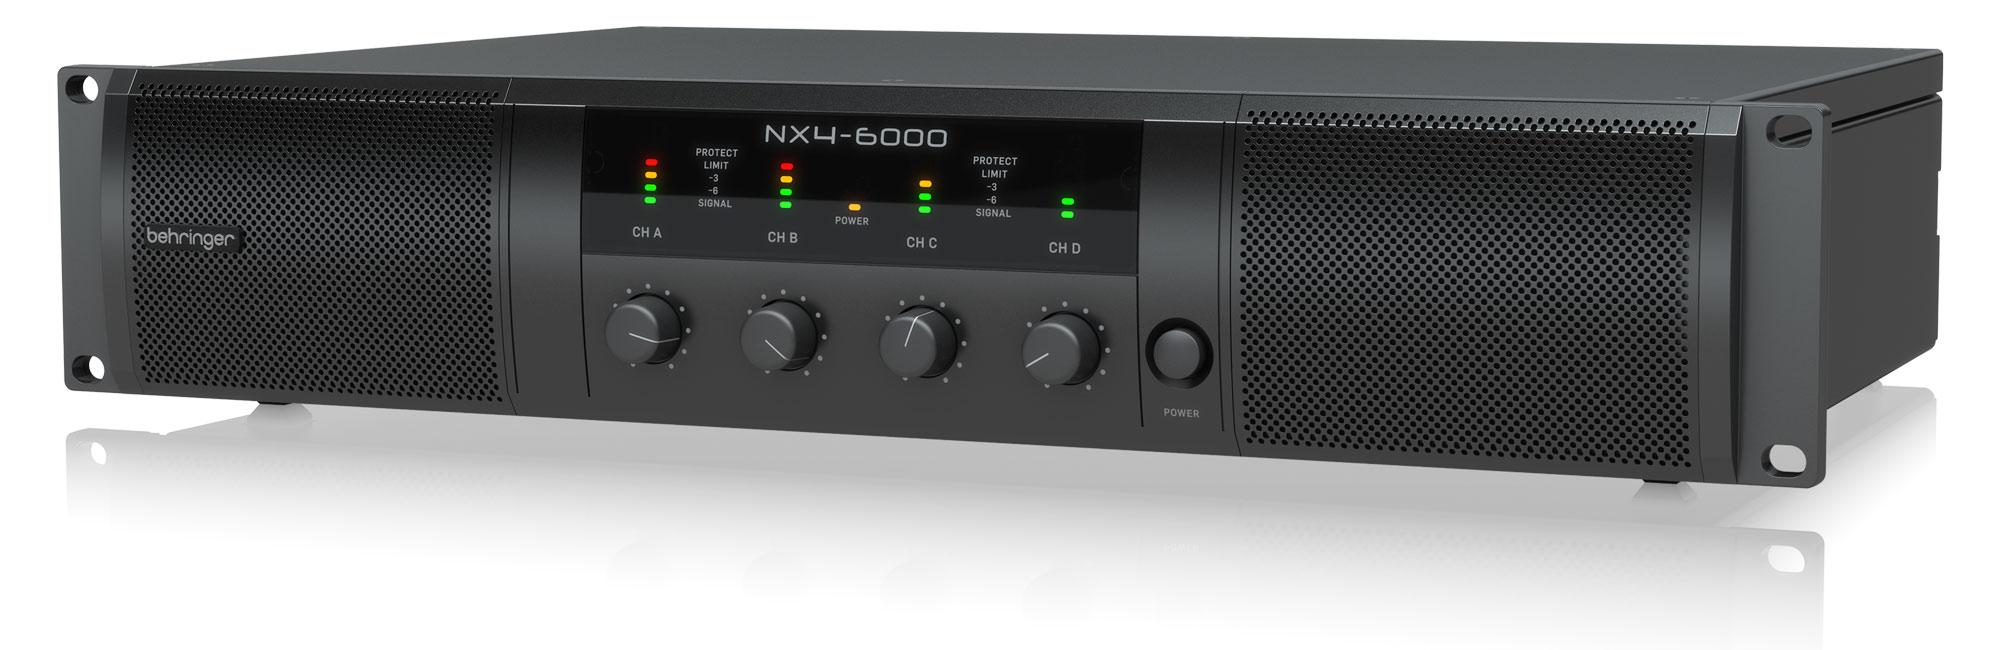 Paendstufen - Behringer NX4 6000 Endstufe - Onlineshop Musikhaus Kirstein